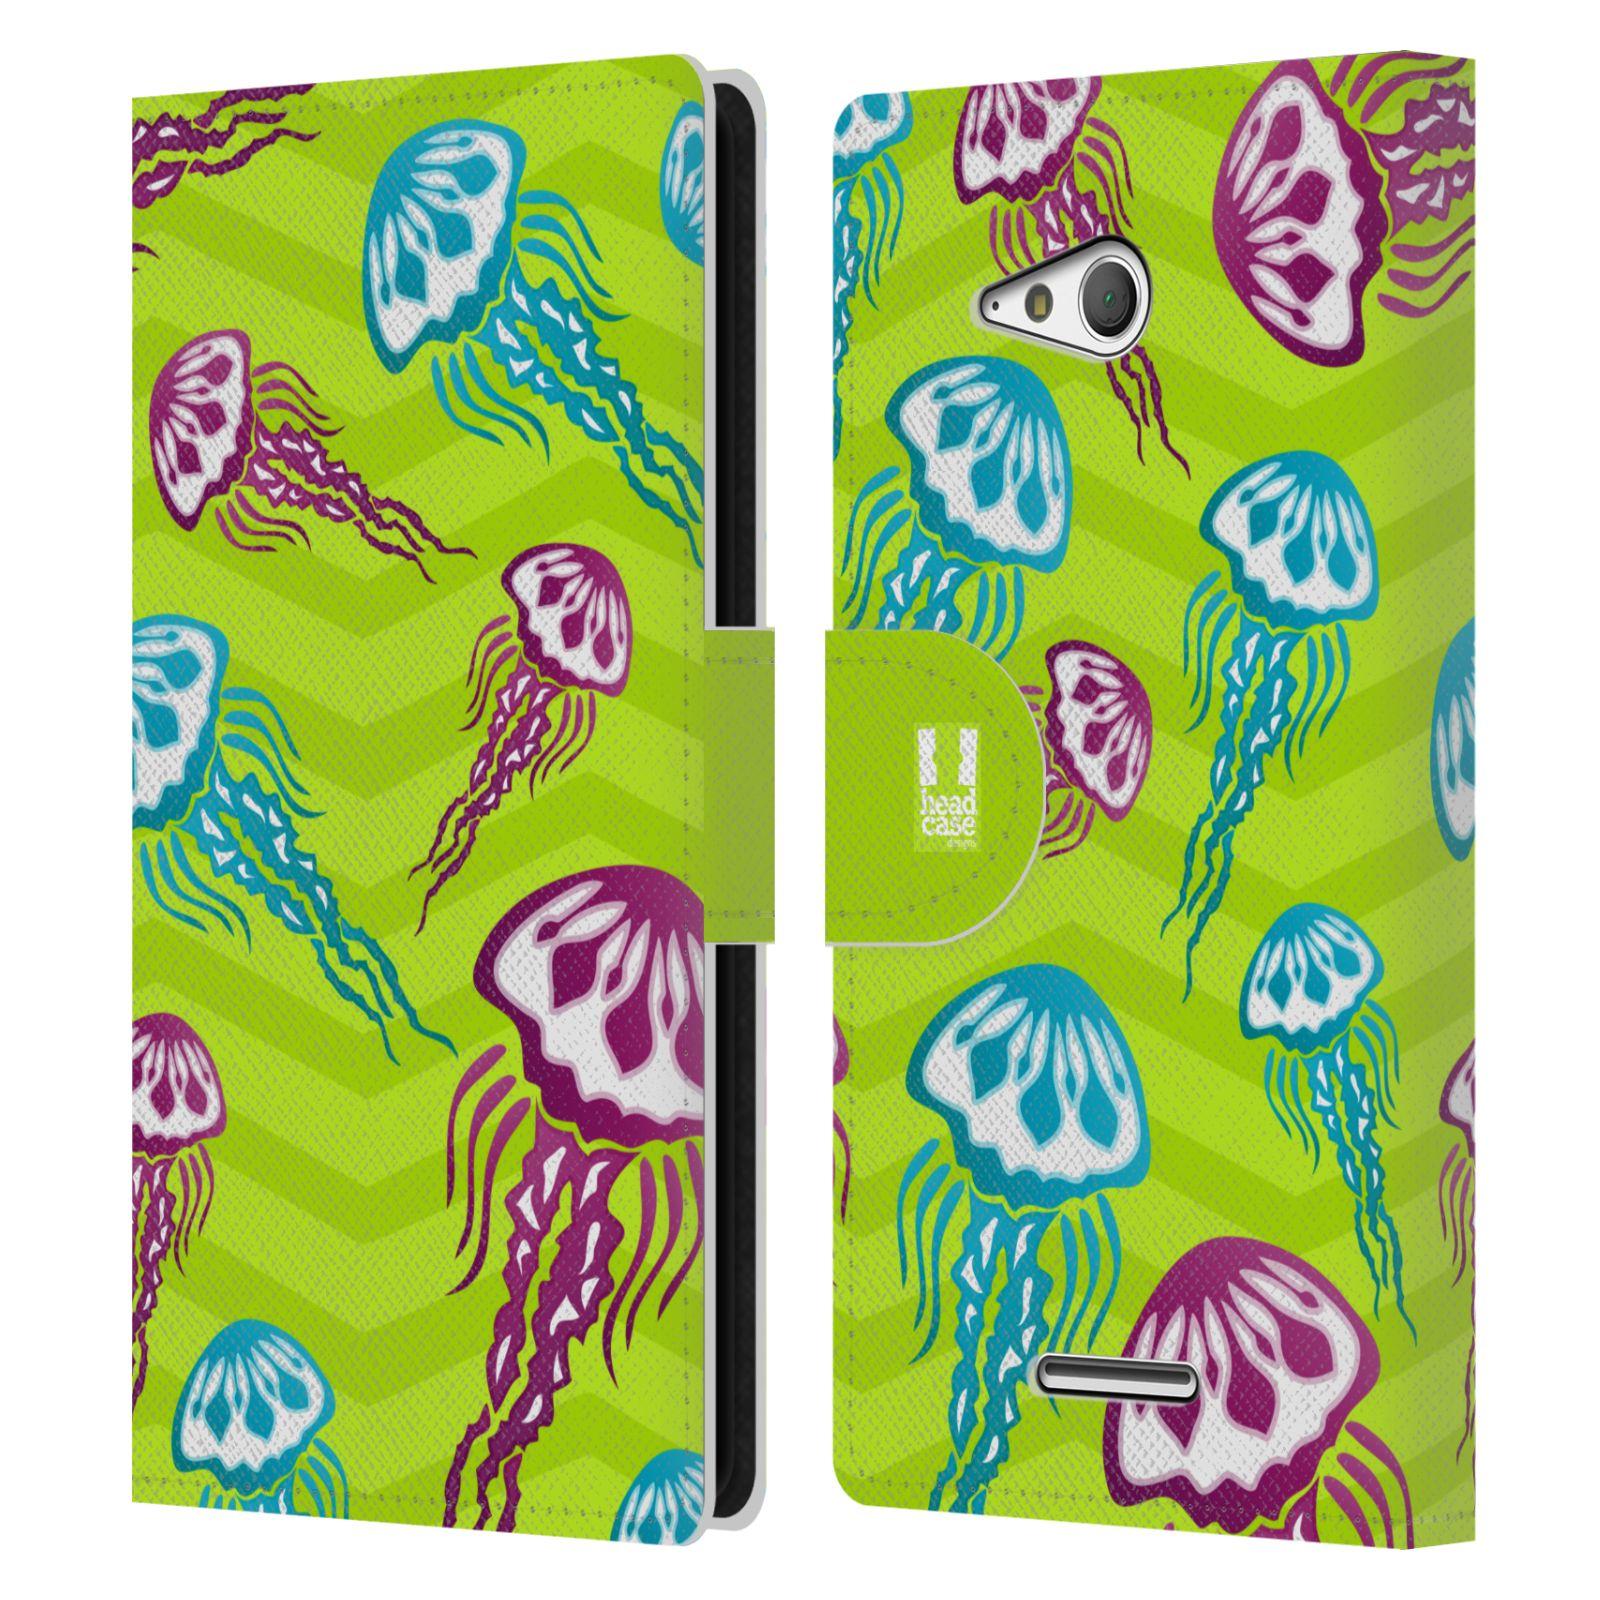 HEAD CASE Flipové pouzdro pro mobil SONY XPERIA E4g Mořský živočich medůza zelená barva